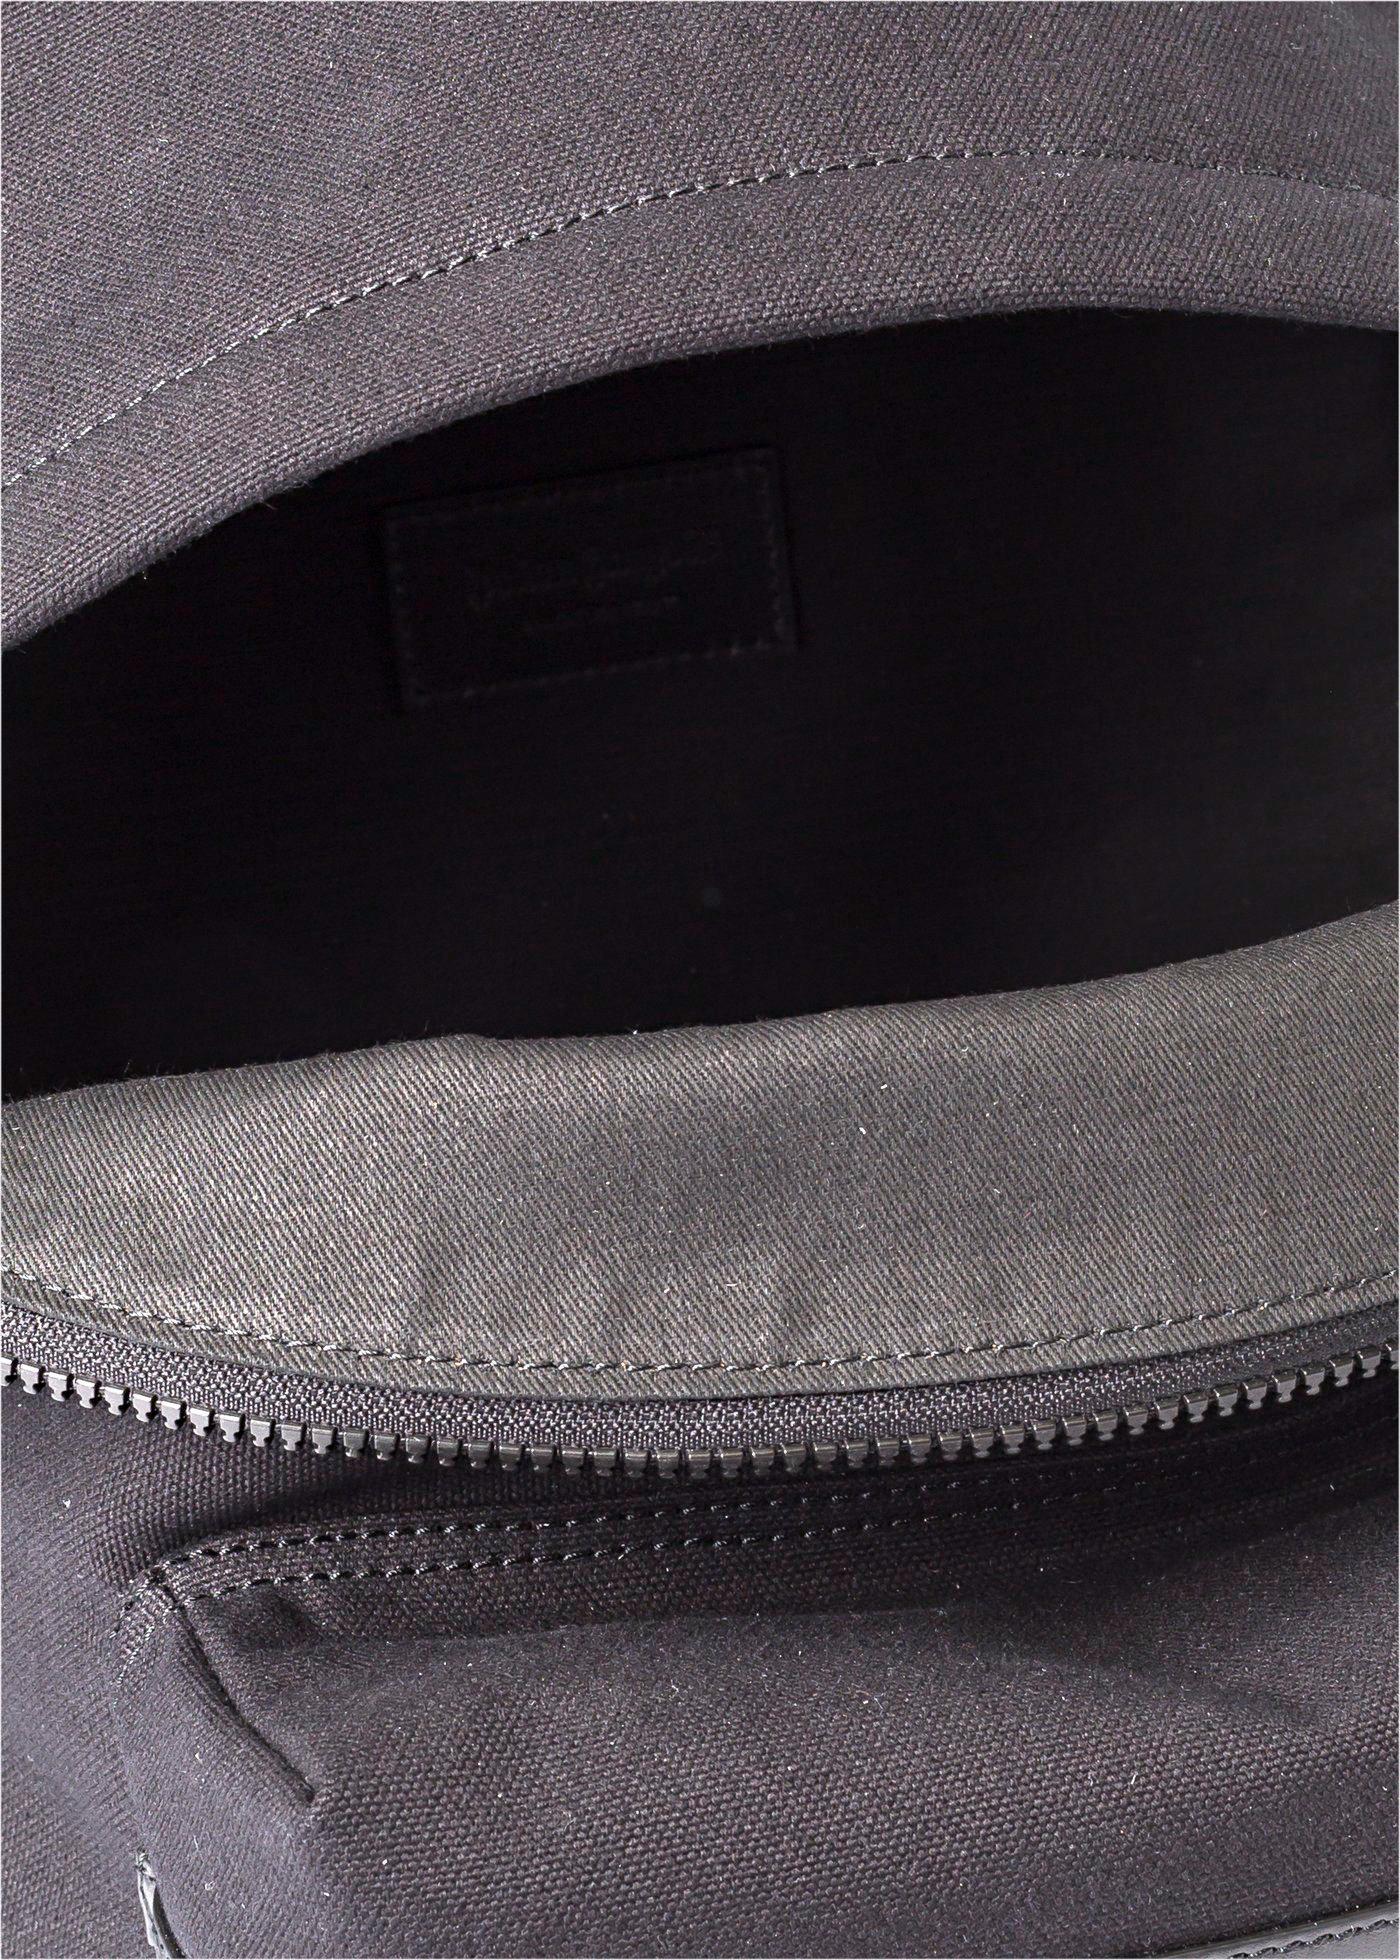 CLASSIC LOGO BACKPACK BLACK SILVER image number 3